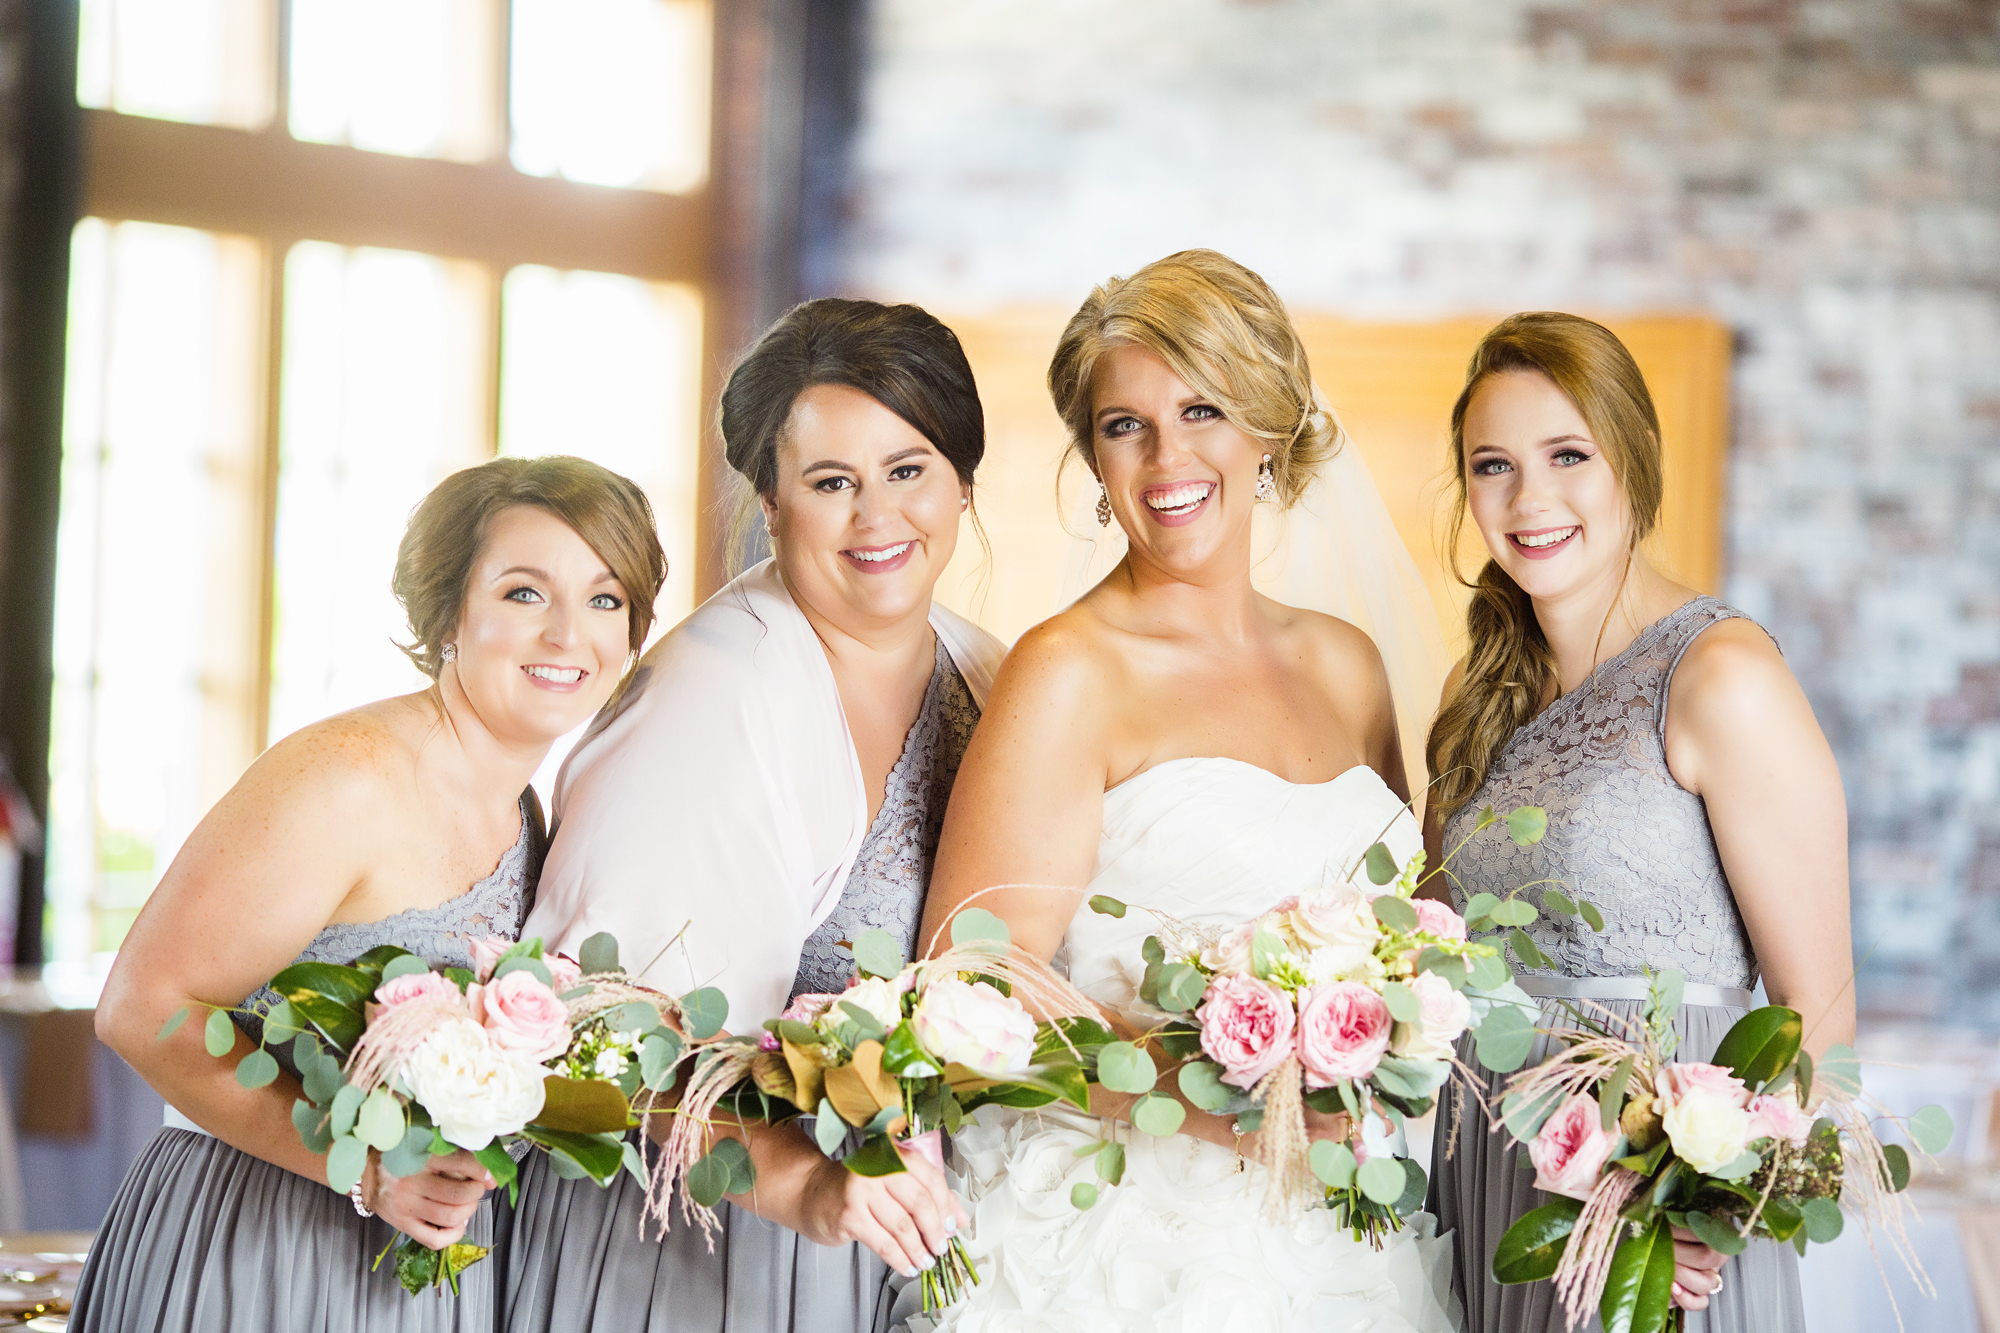 Seriously_Sabrina_Photography_Ashland_Kentucky_Train_Depot_Wedding_Parsons22.jpg